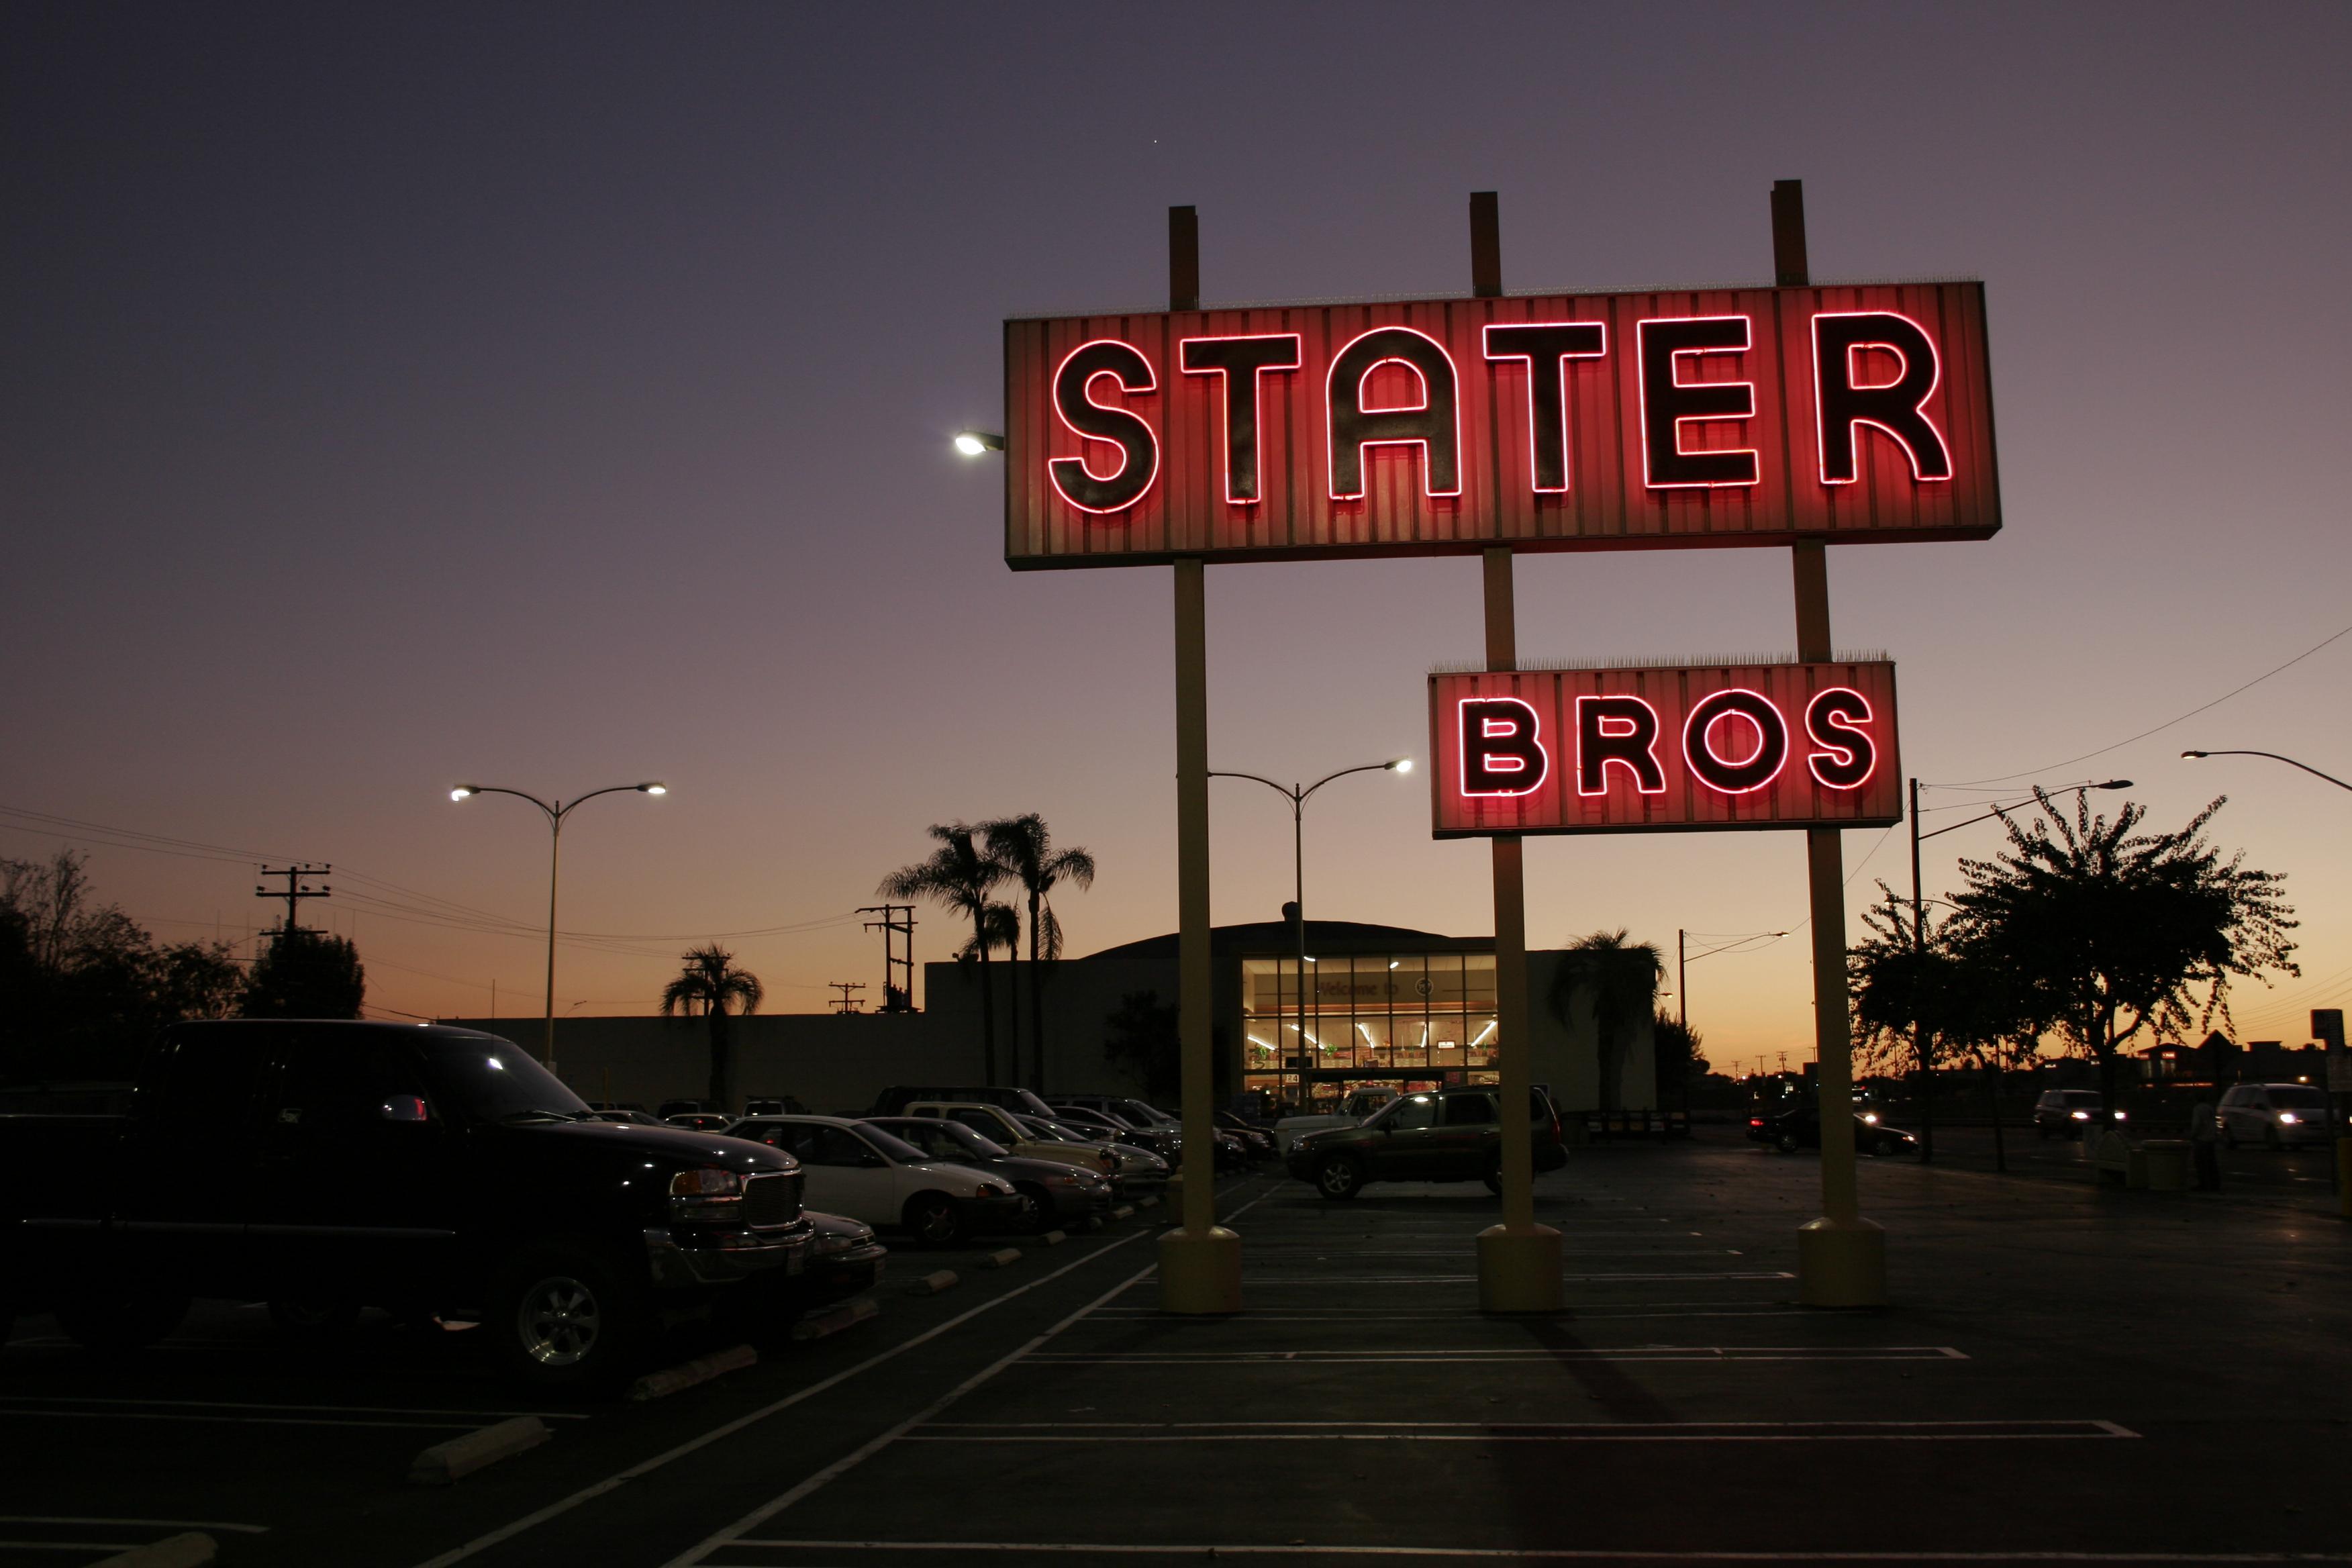 Stater Bros. - 2180 Newport Boulevard, Costa Mesa, California U.S.A. - December 3, 2005